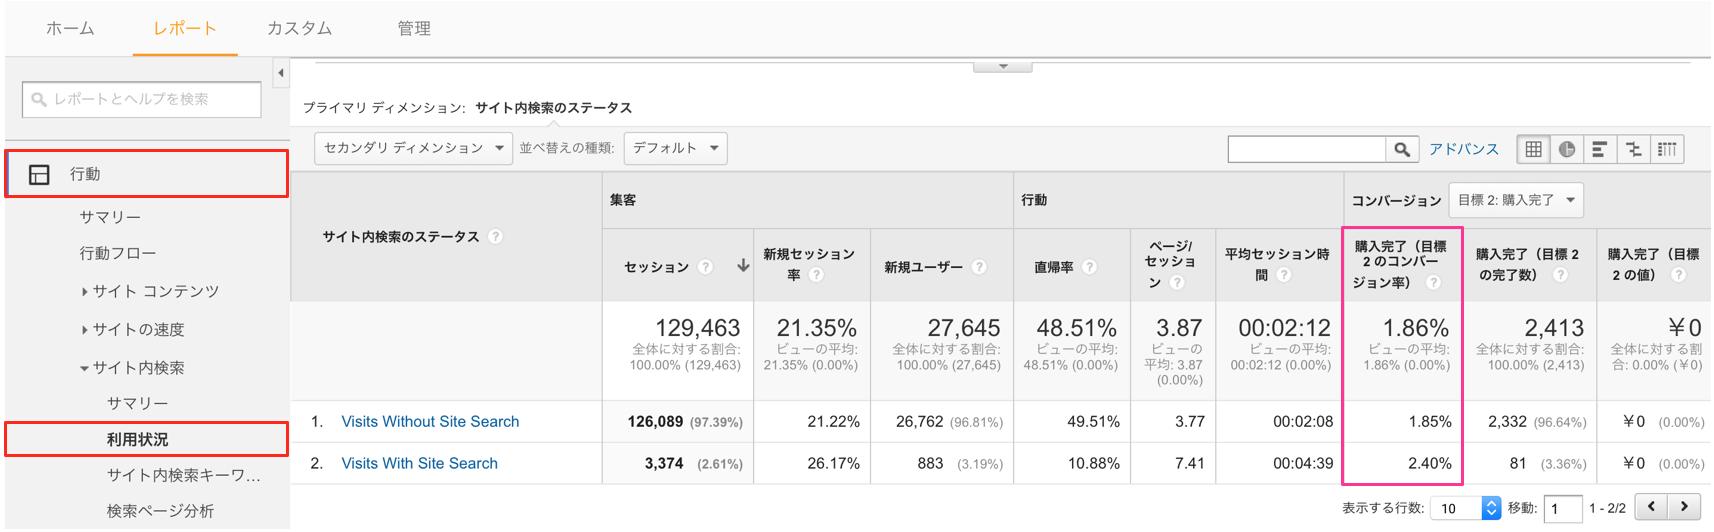 Googleアナリティクスのサイト内検索利用状況レポート